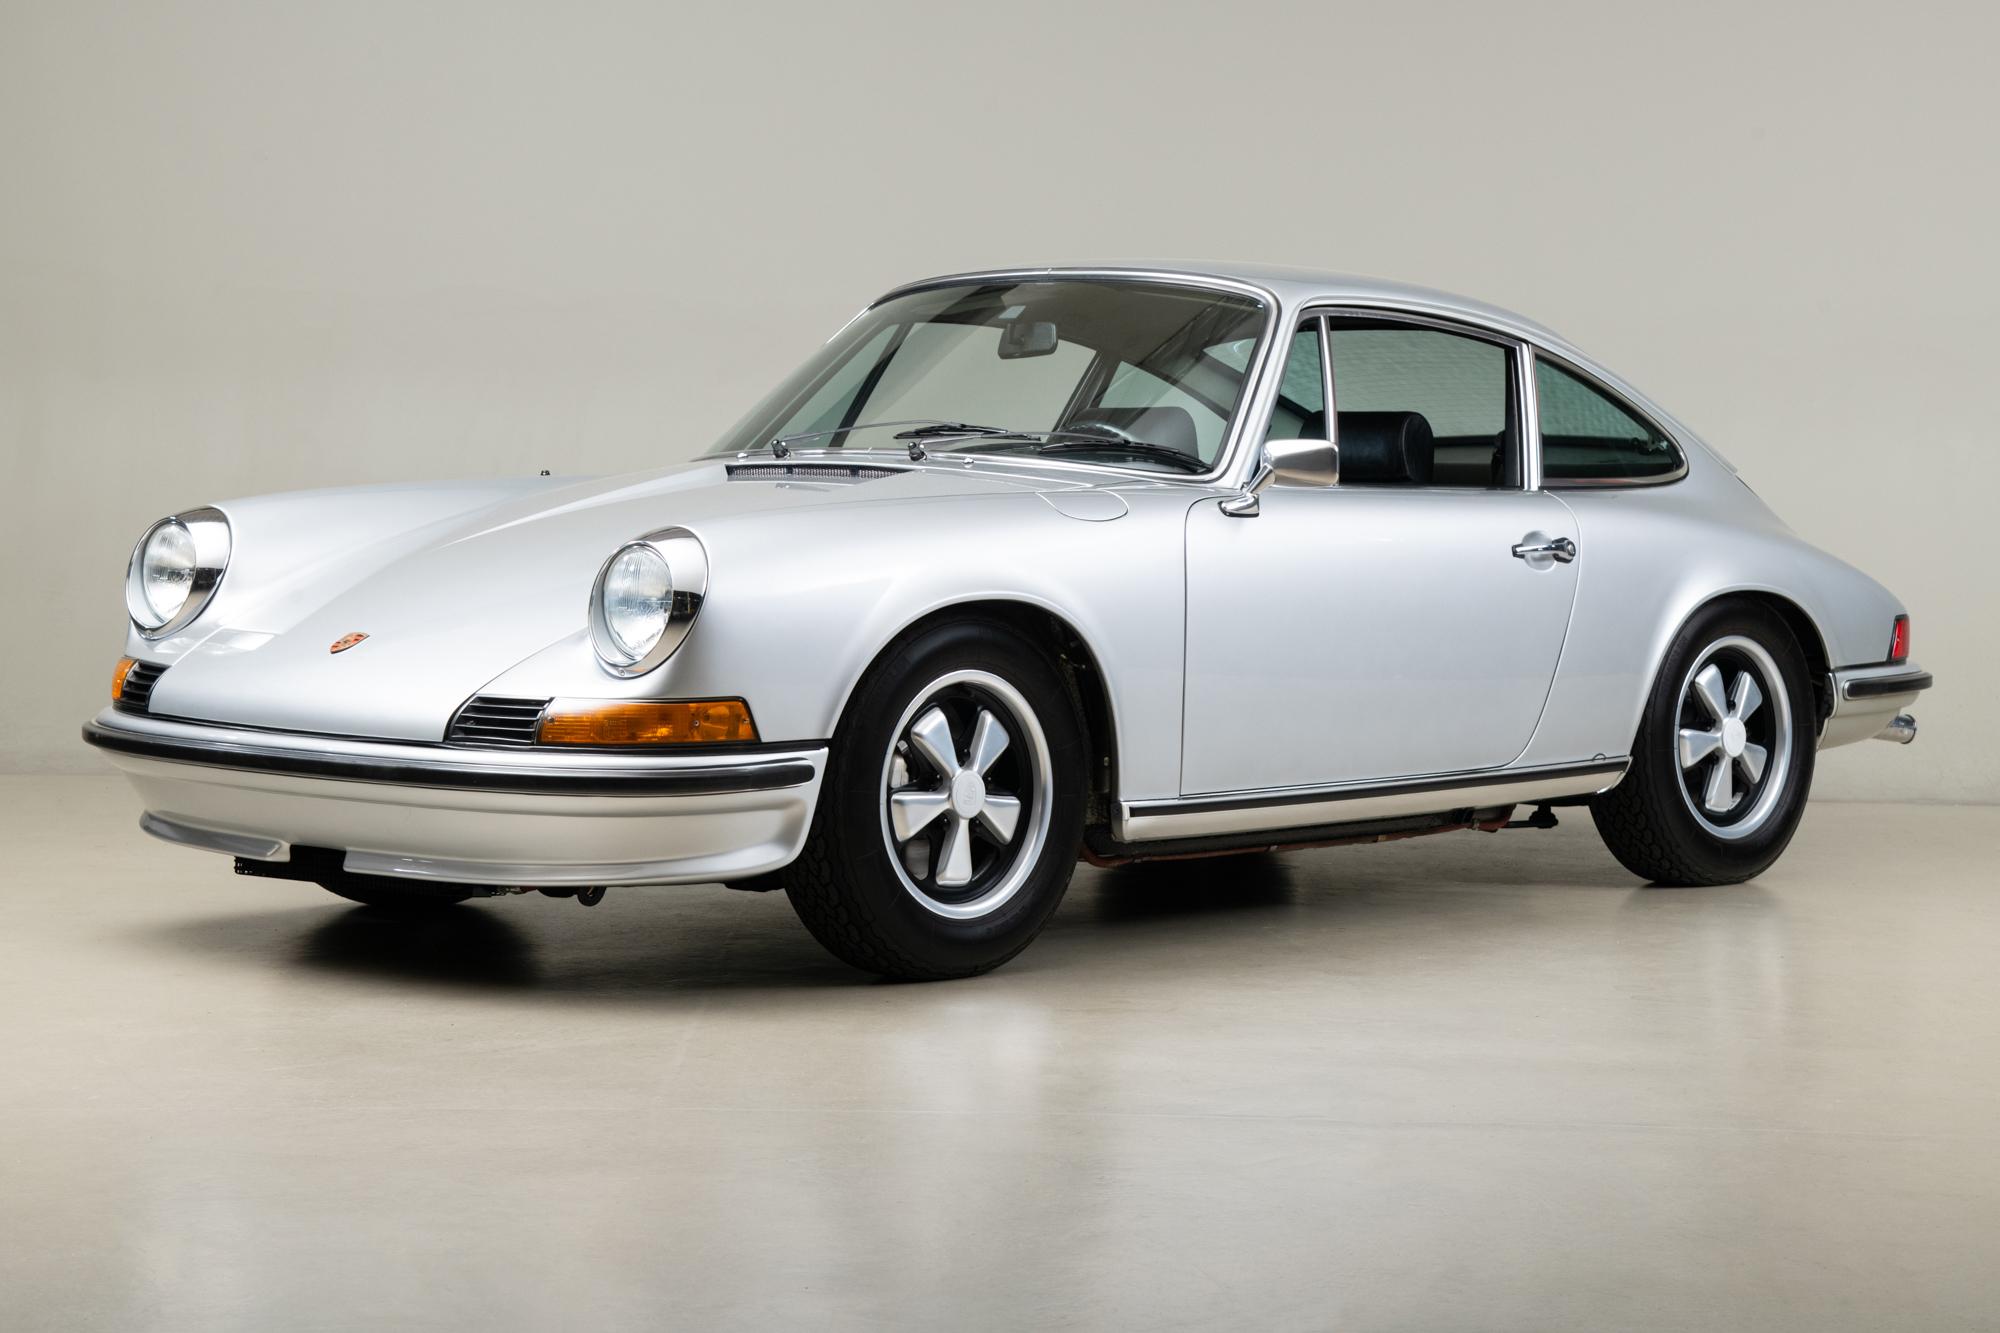 1973 Porsche 911S , SILVER METALLIC, VIN 9113300811, MILEAGE 20811